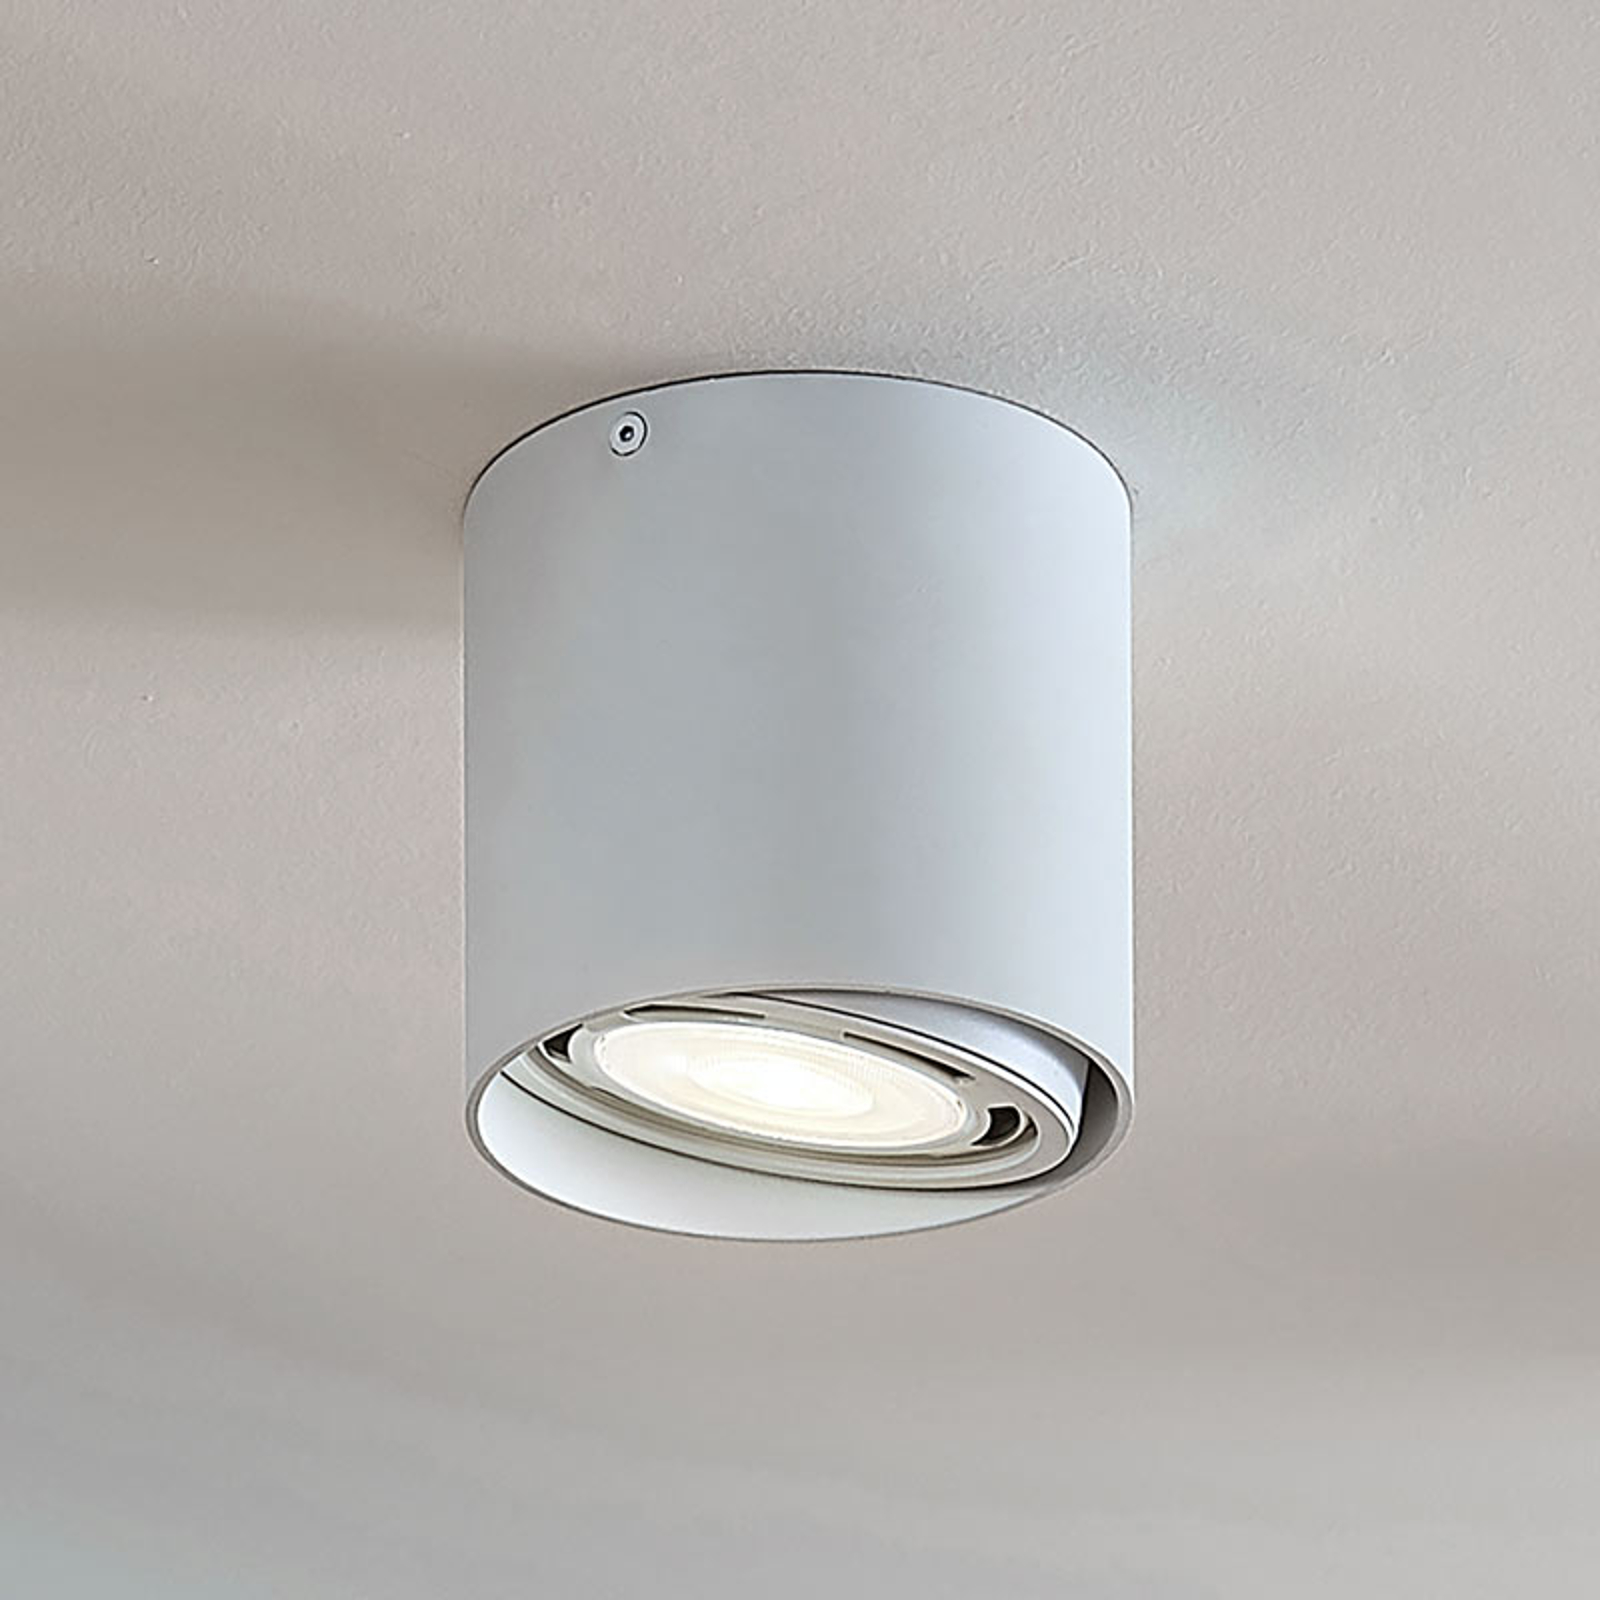 Rosalie LED-downlight 1 lyskilde rund hvit